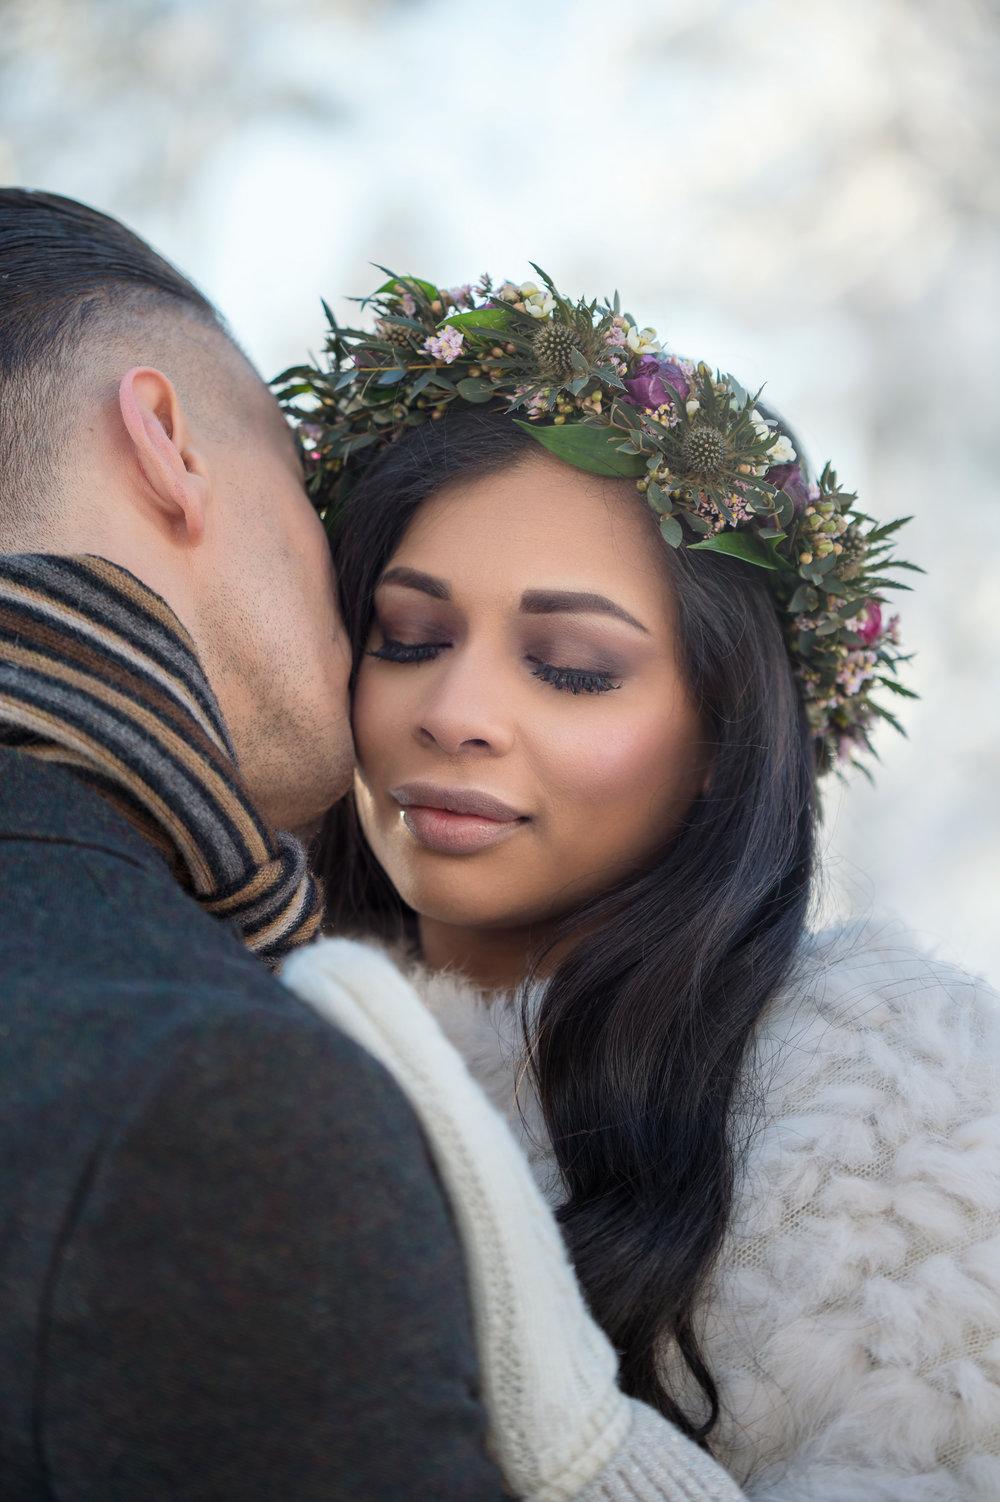 vinterbröllop+tyllkjol+makeup+blomsterkrans